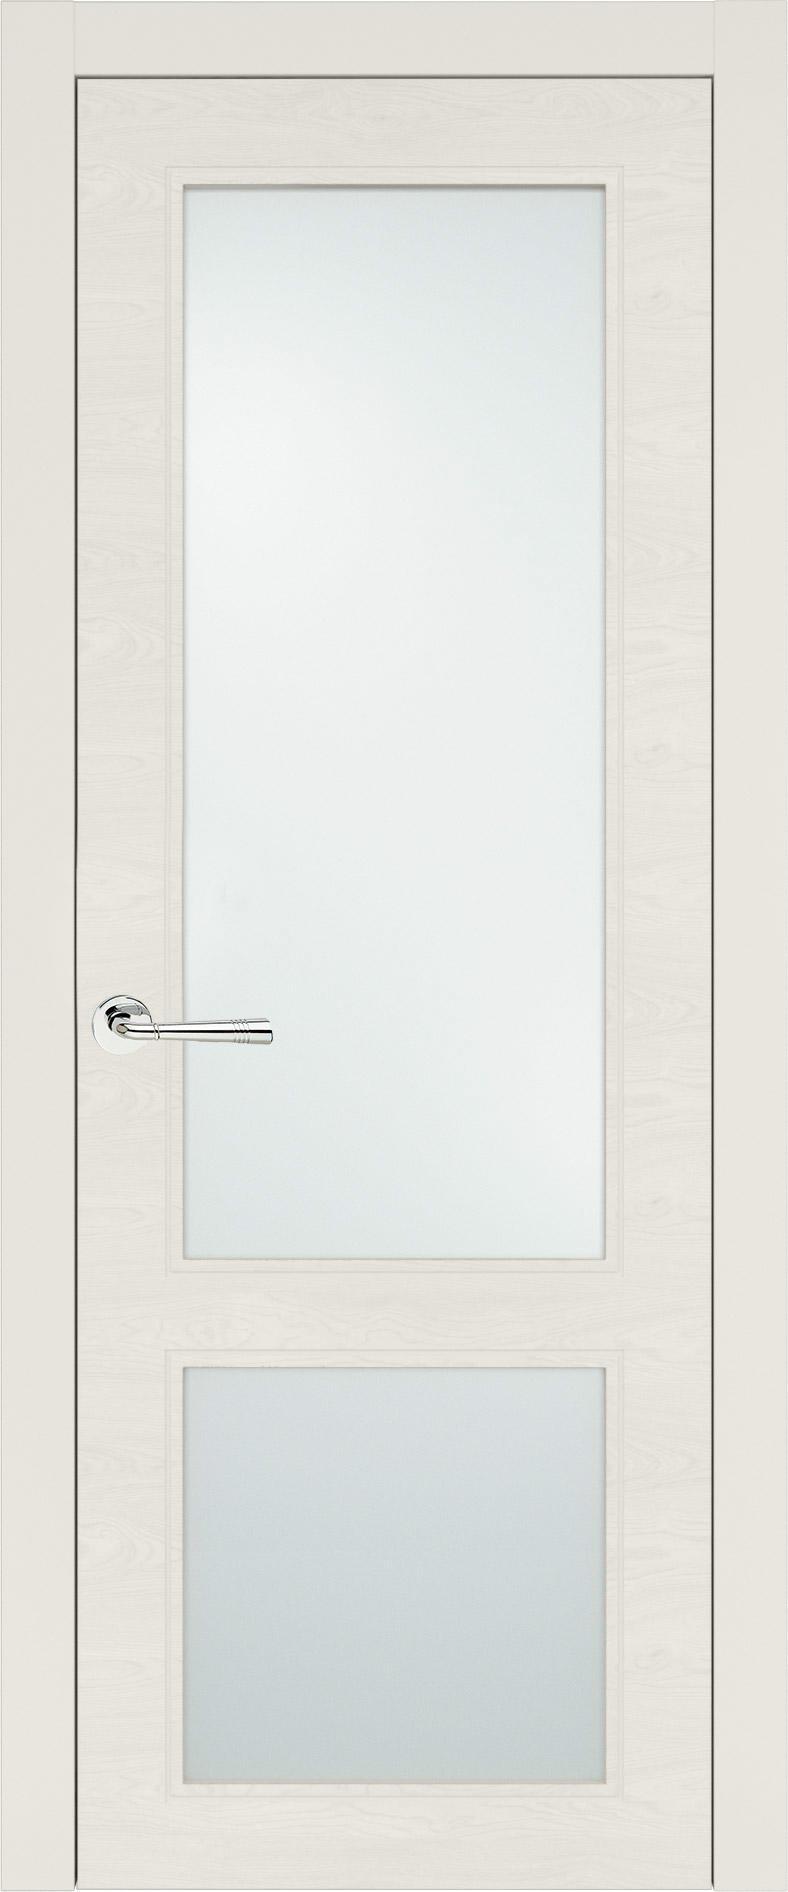 Dinastia Neo Classic цвет - Бежевая эмаль по шпону (RAL 9010) Со стеклом (ДО)